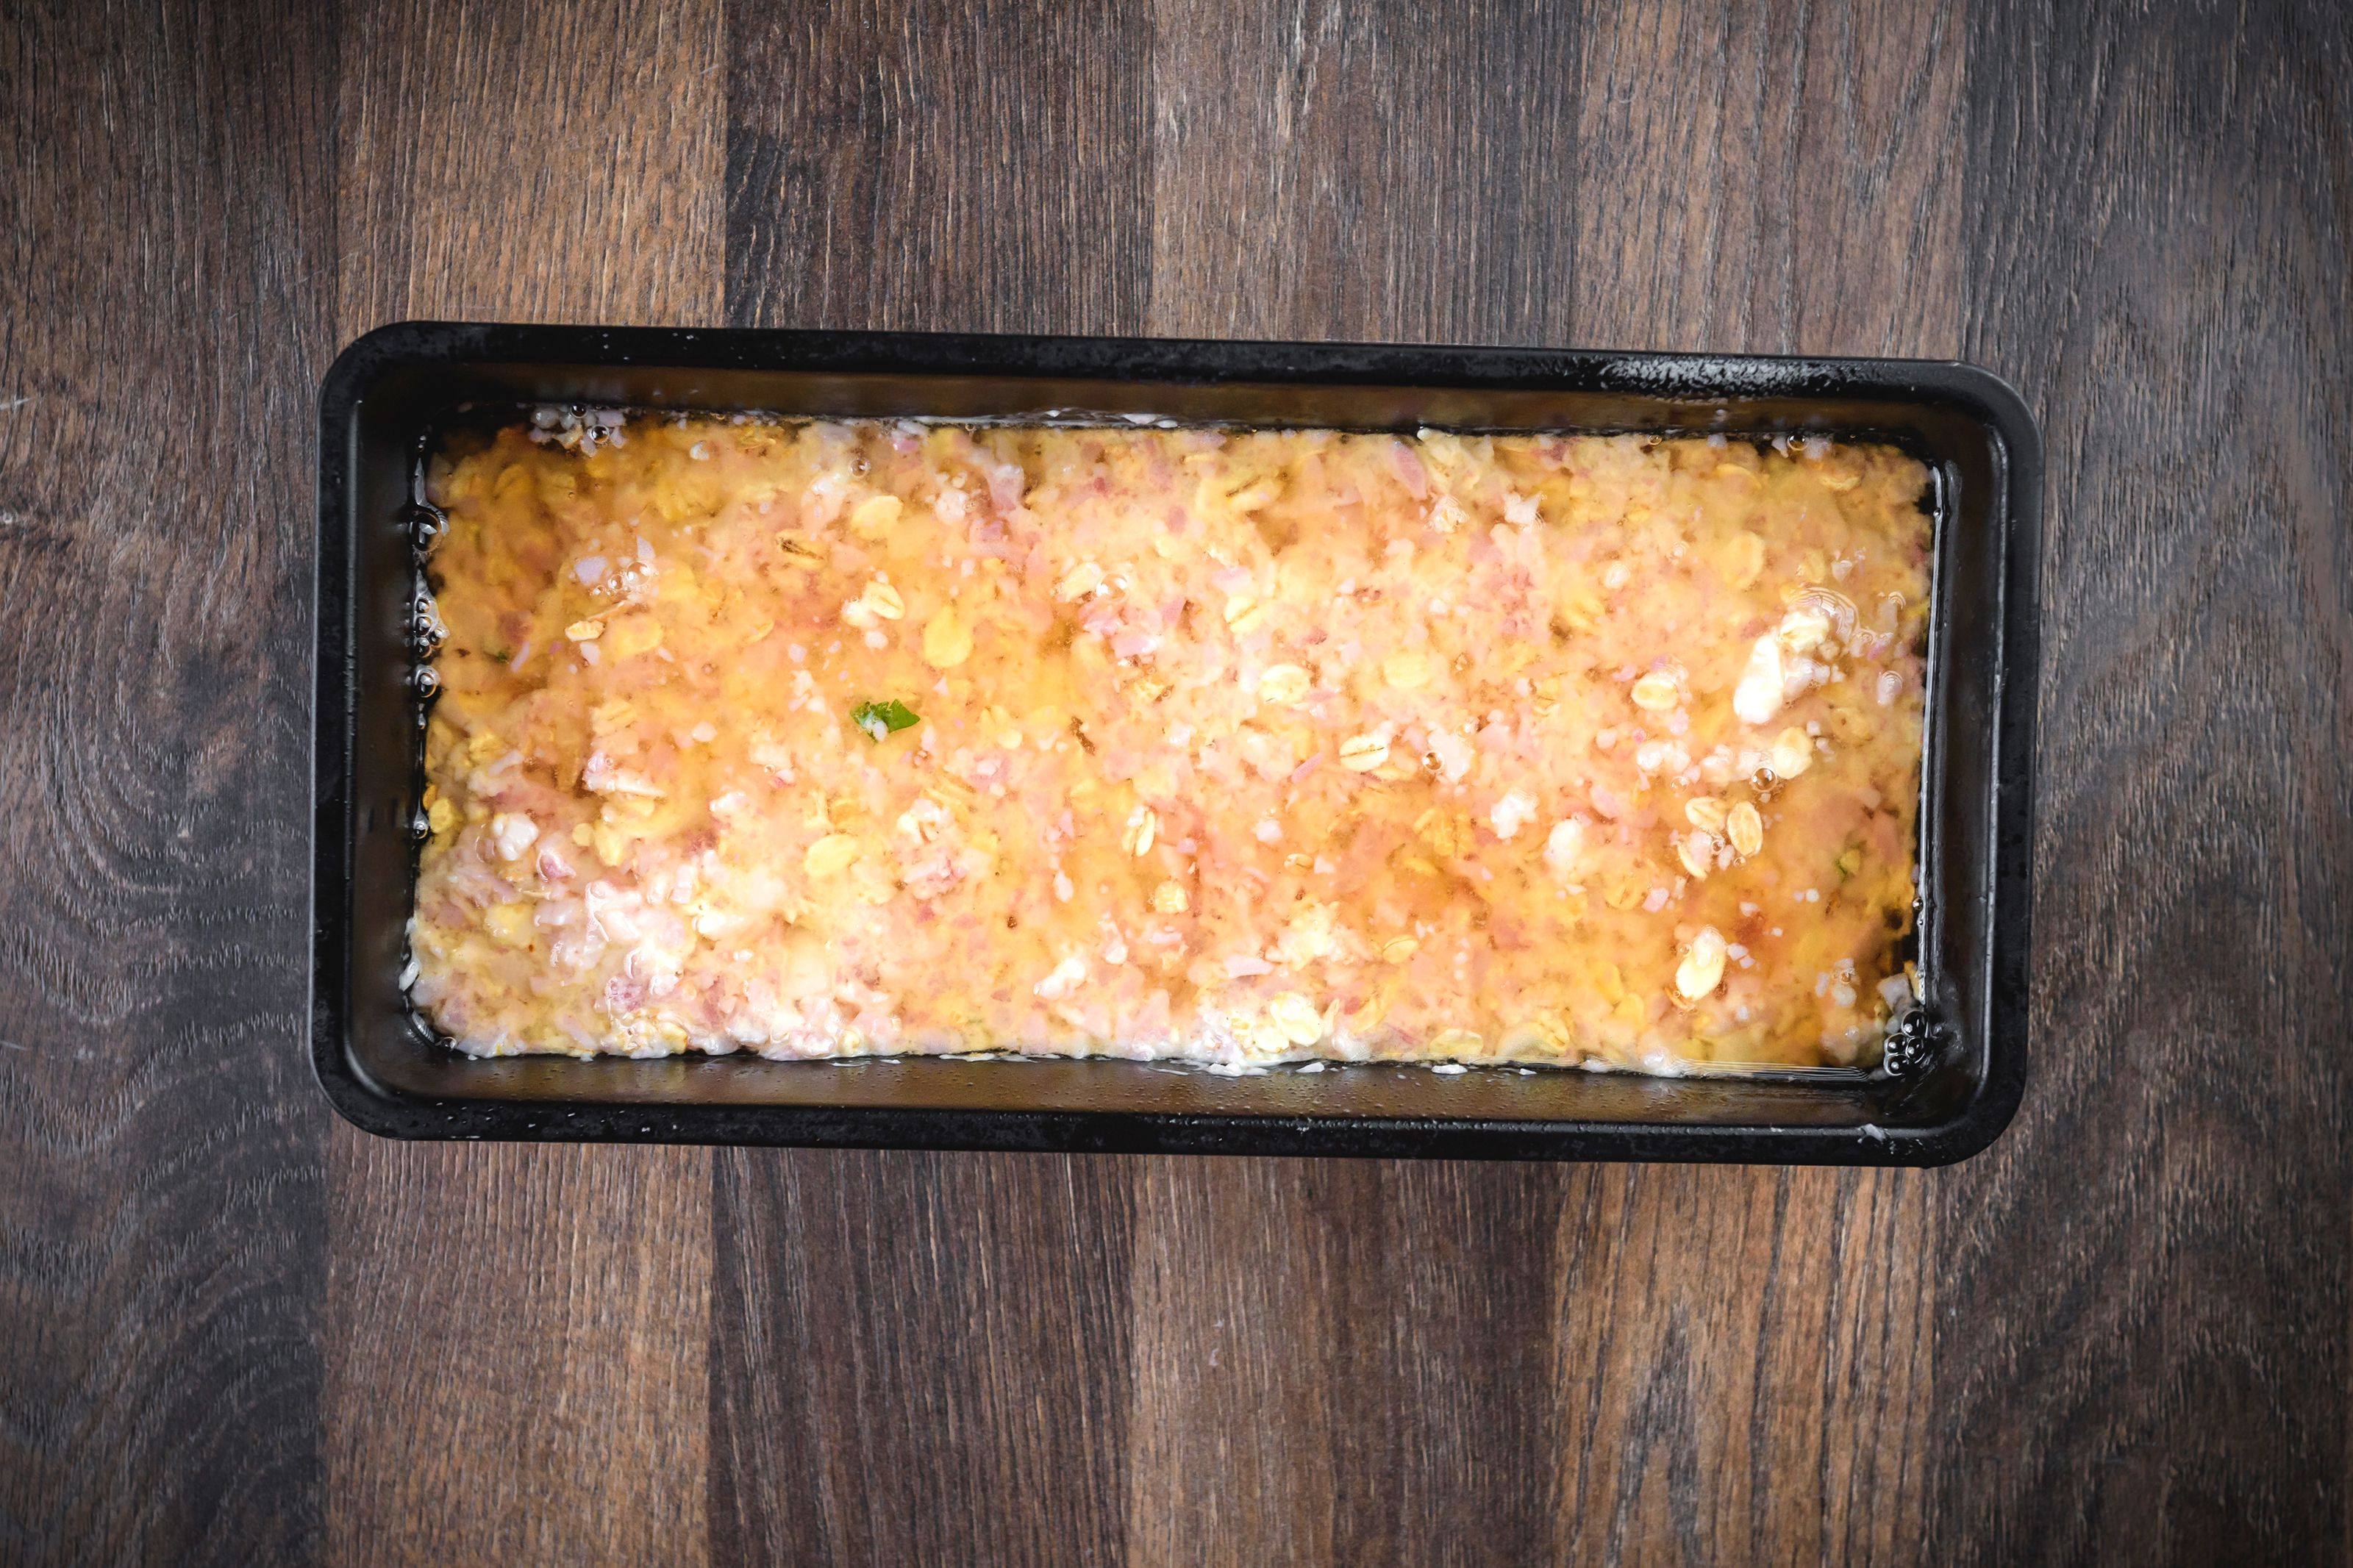 Pour brown sugar mixture over ham